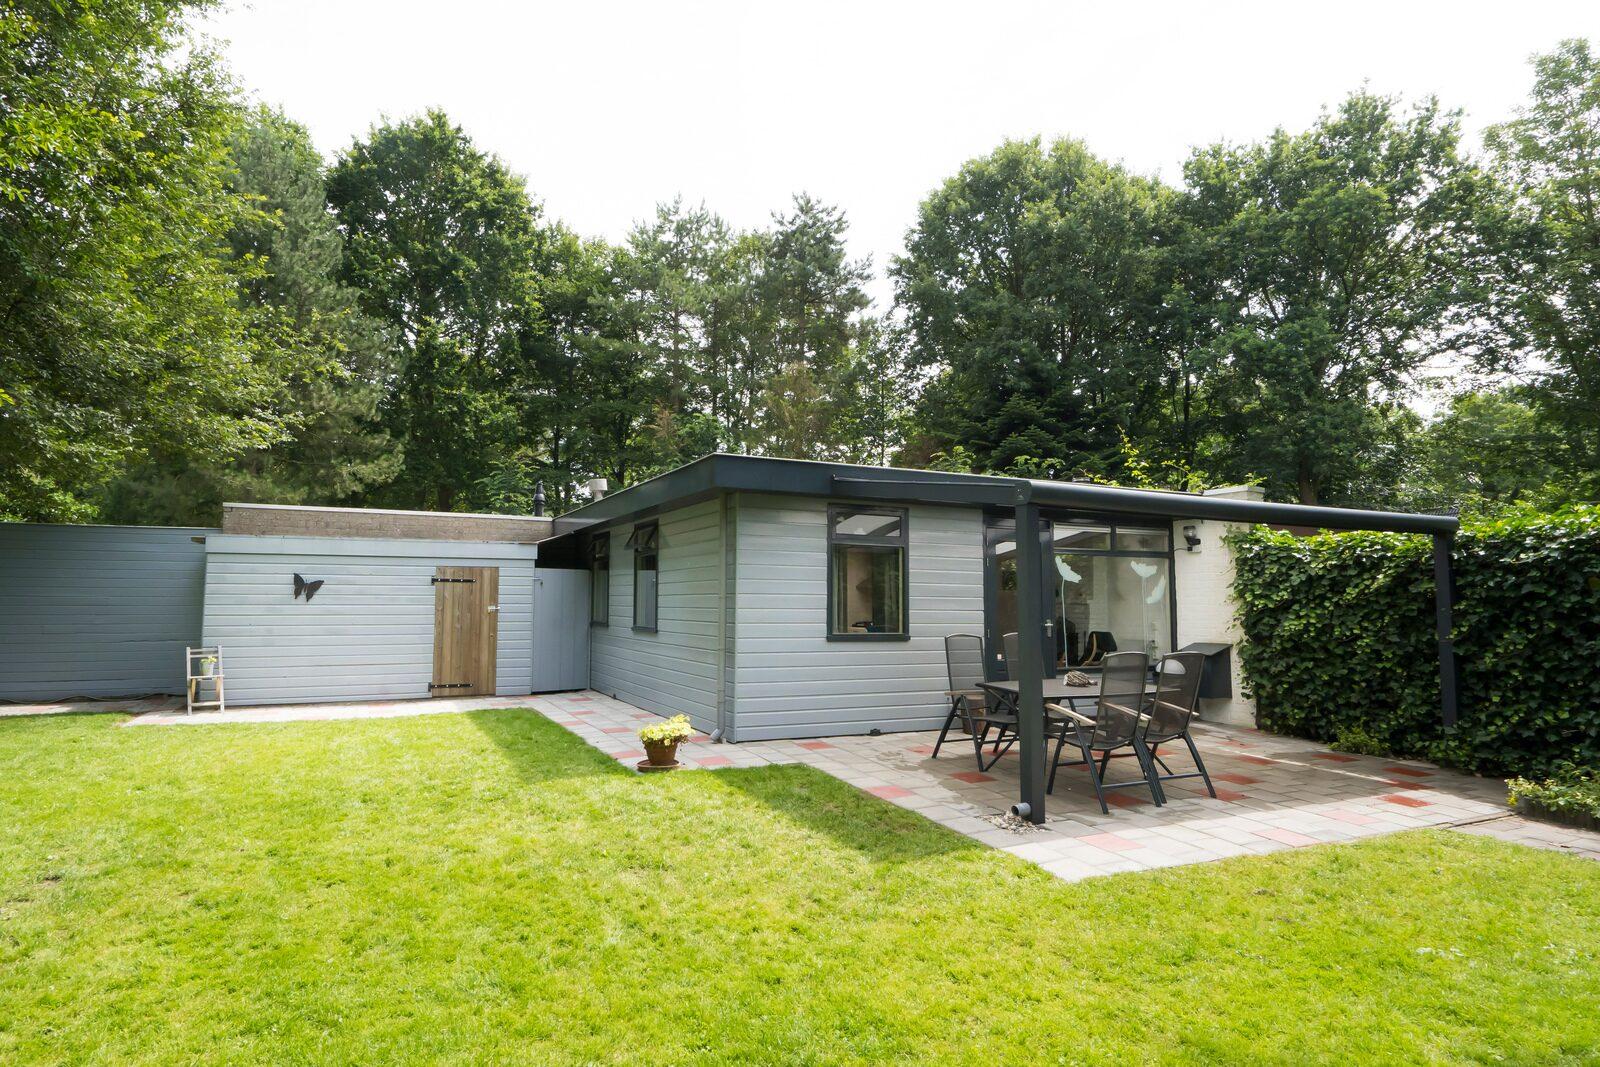 Bungalow 186 - Select bungalow